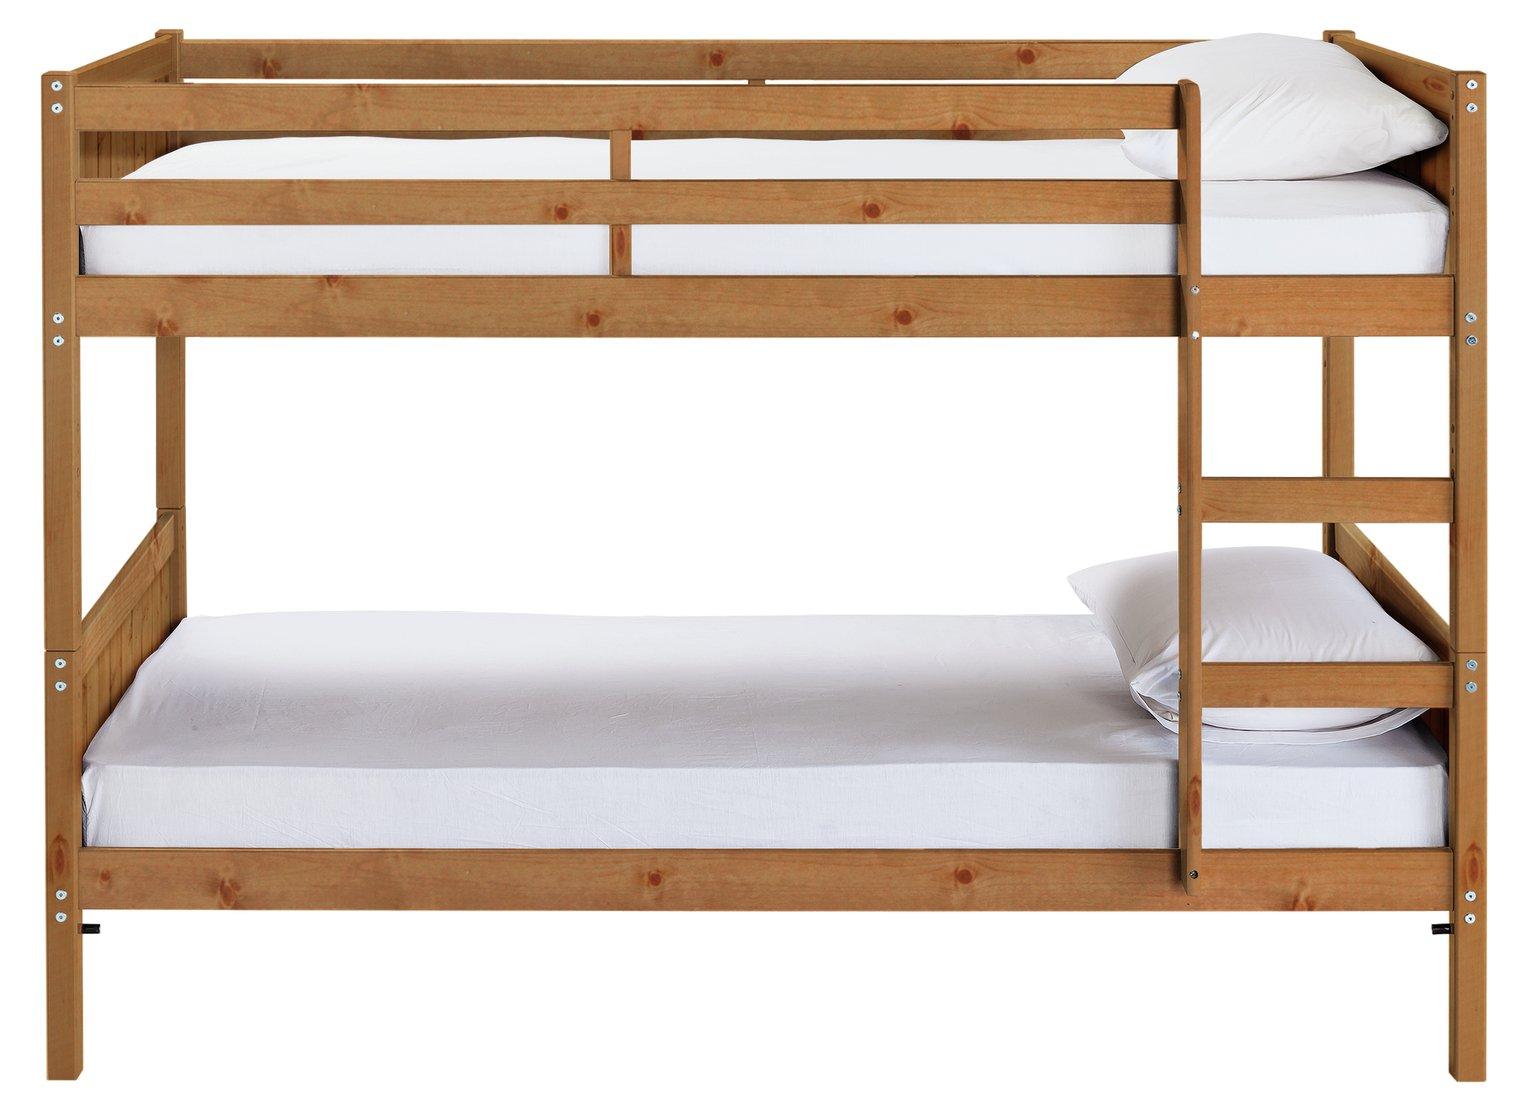 Argos Home Detachable Pine Bunk Bed, Drawer & 2 Mattresses